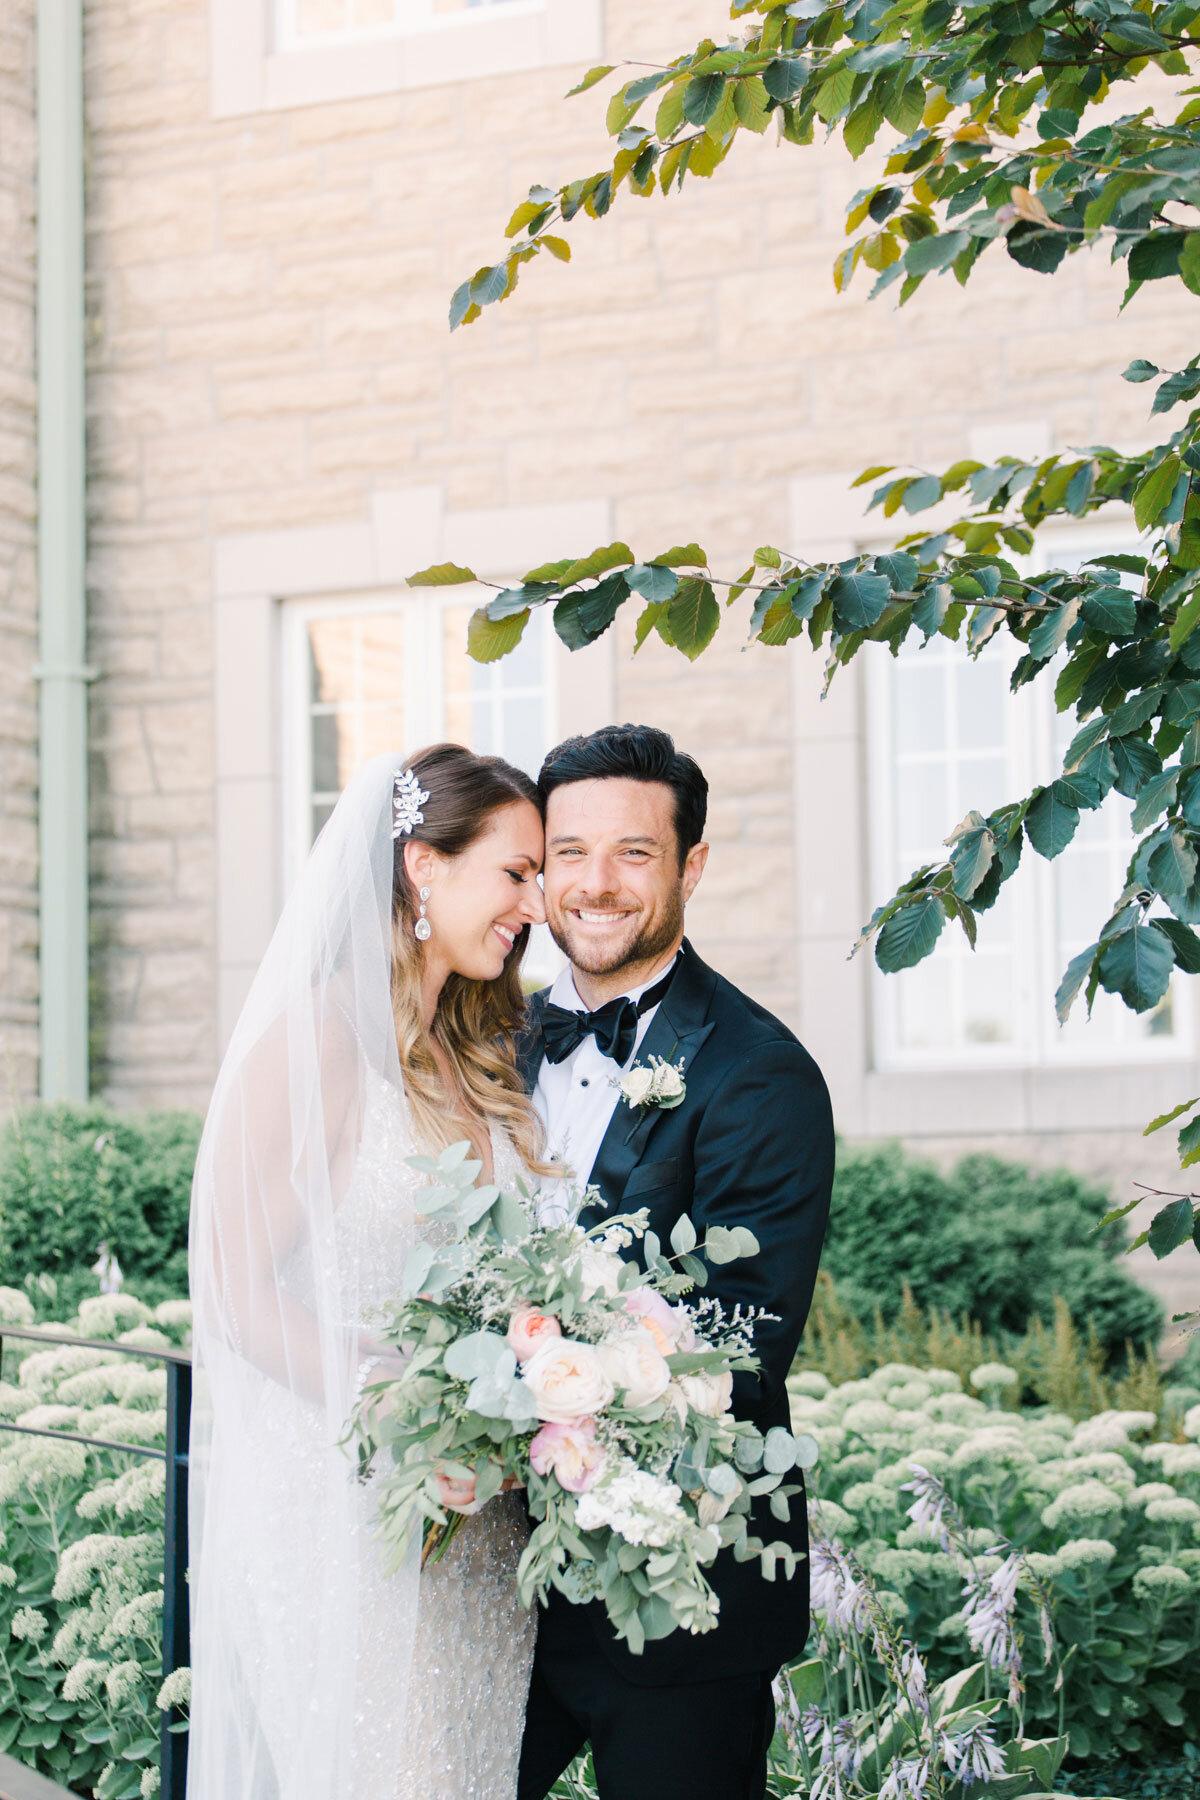 Chateau-des-Charmes-Wedding-Summer-Vineyard-Bride-Niagara-on-the-Lake-photos-by-Gemini-Photography-Ontario-0036.jpg